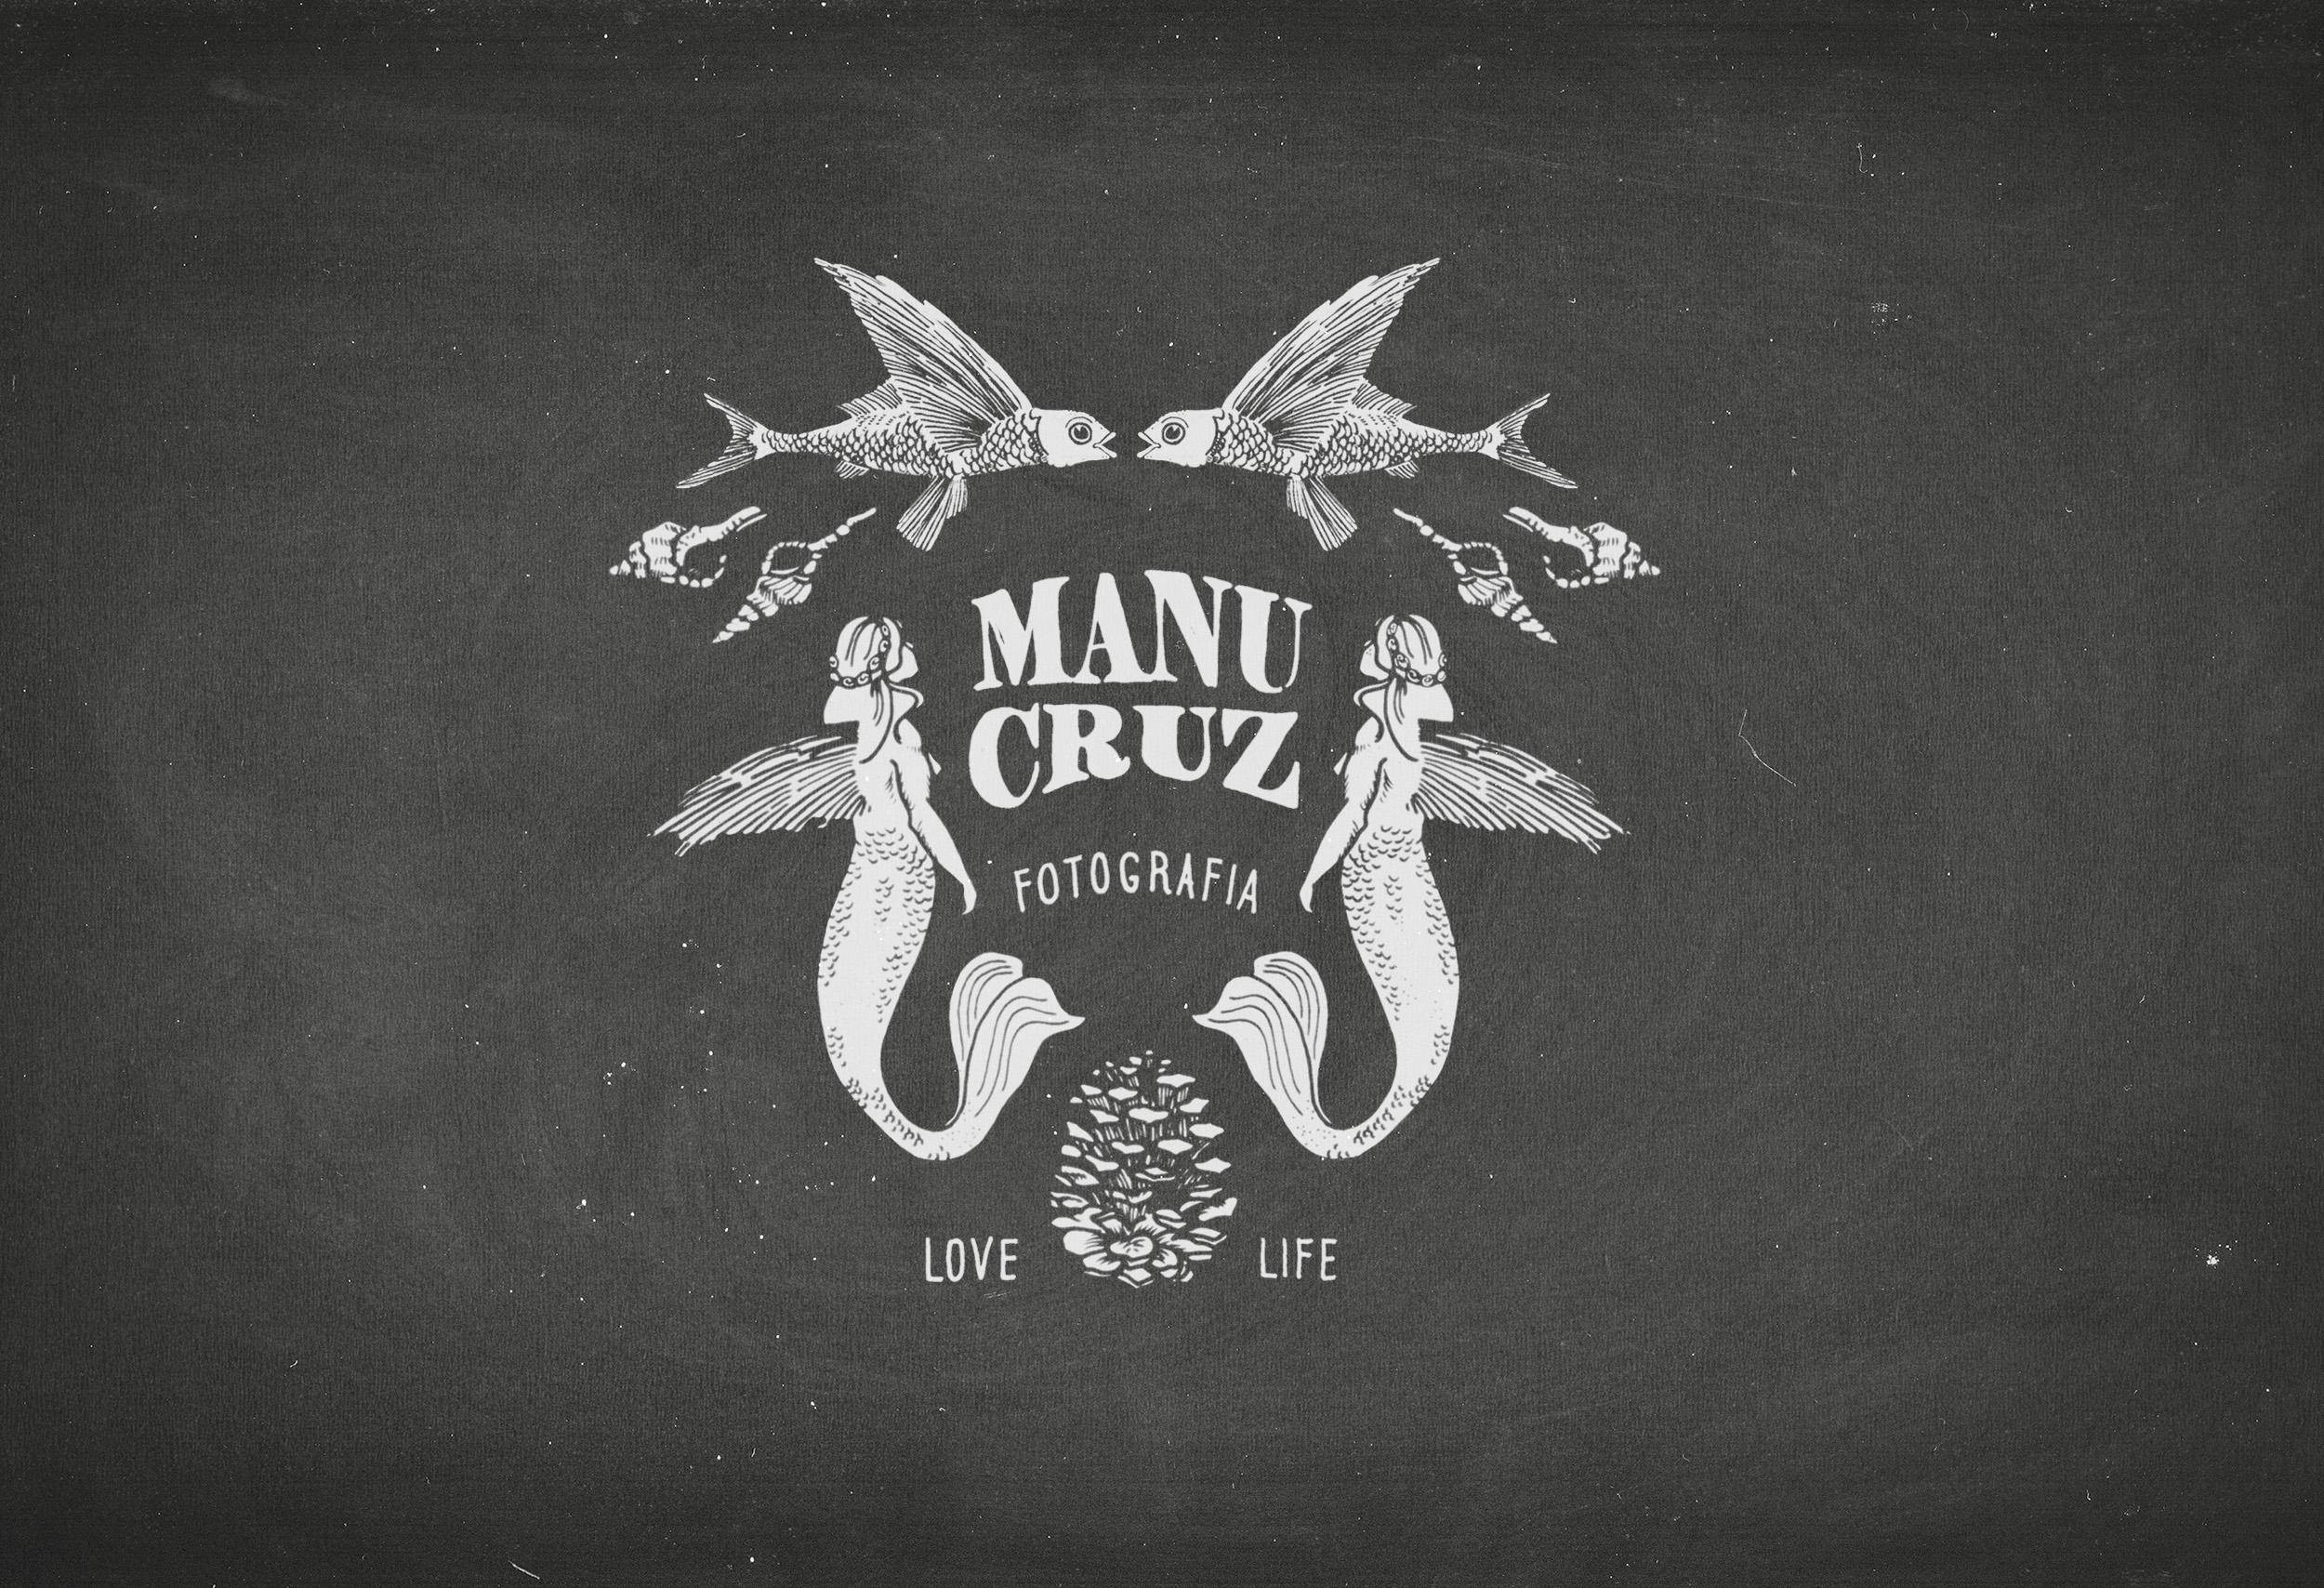 manucruz_pizarra.jpg